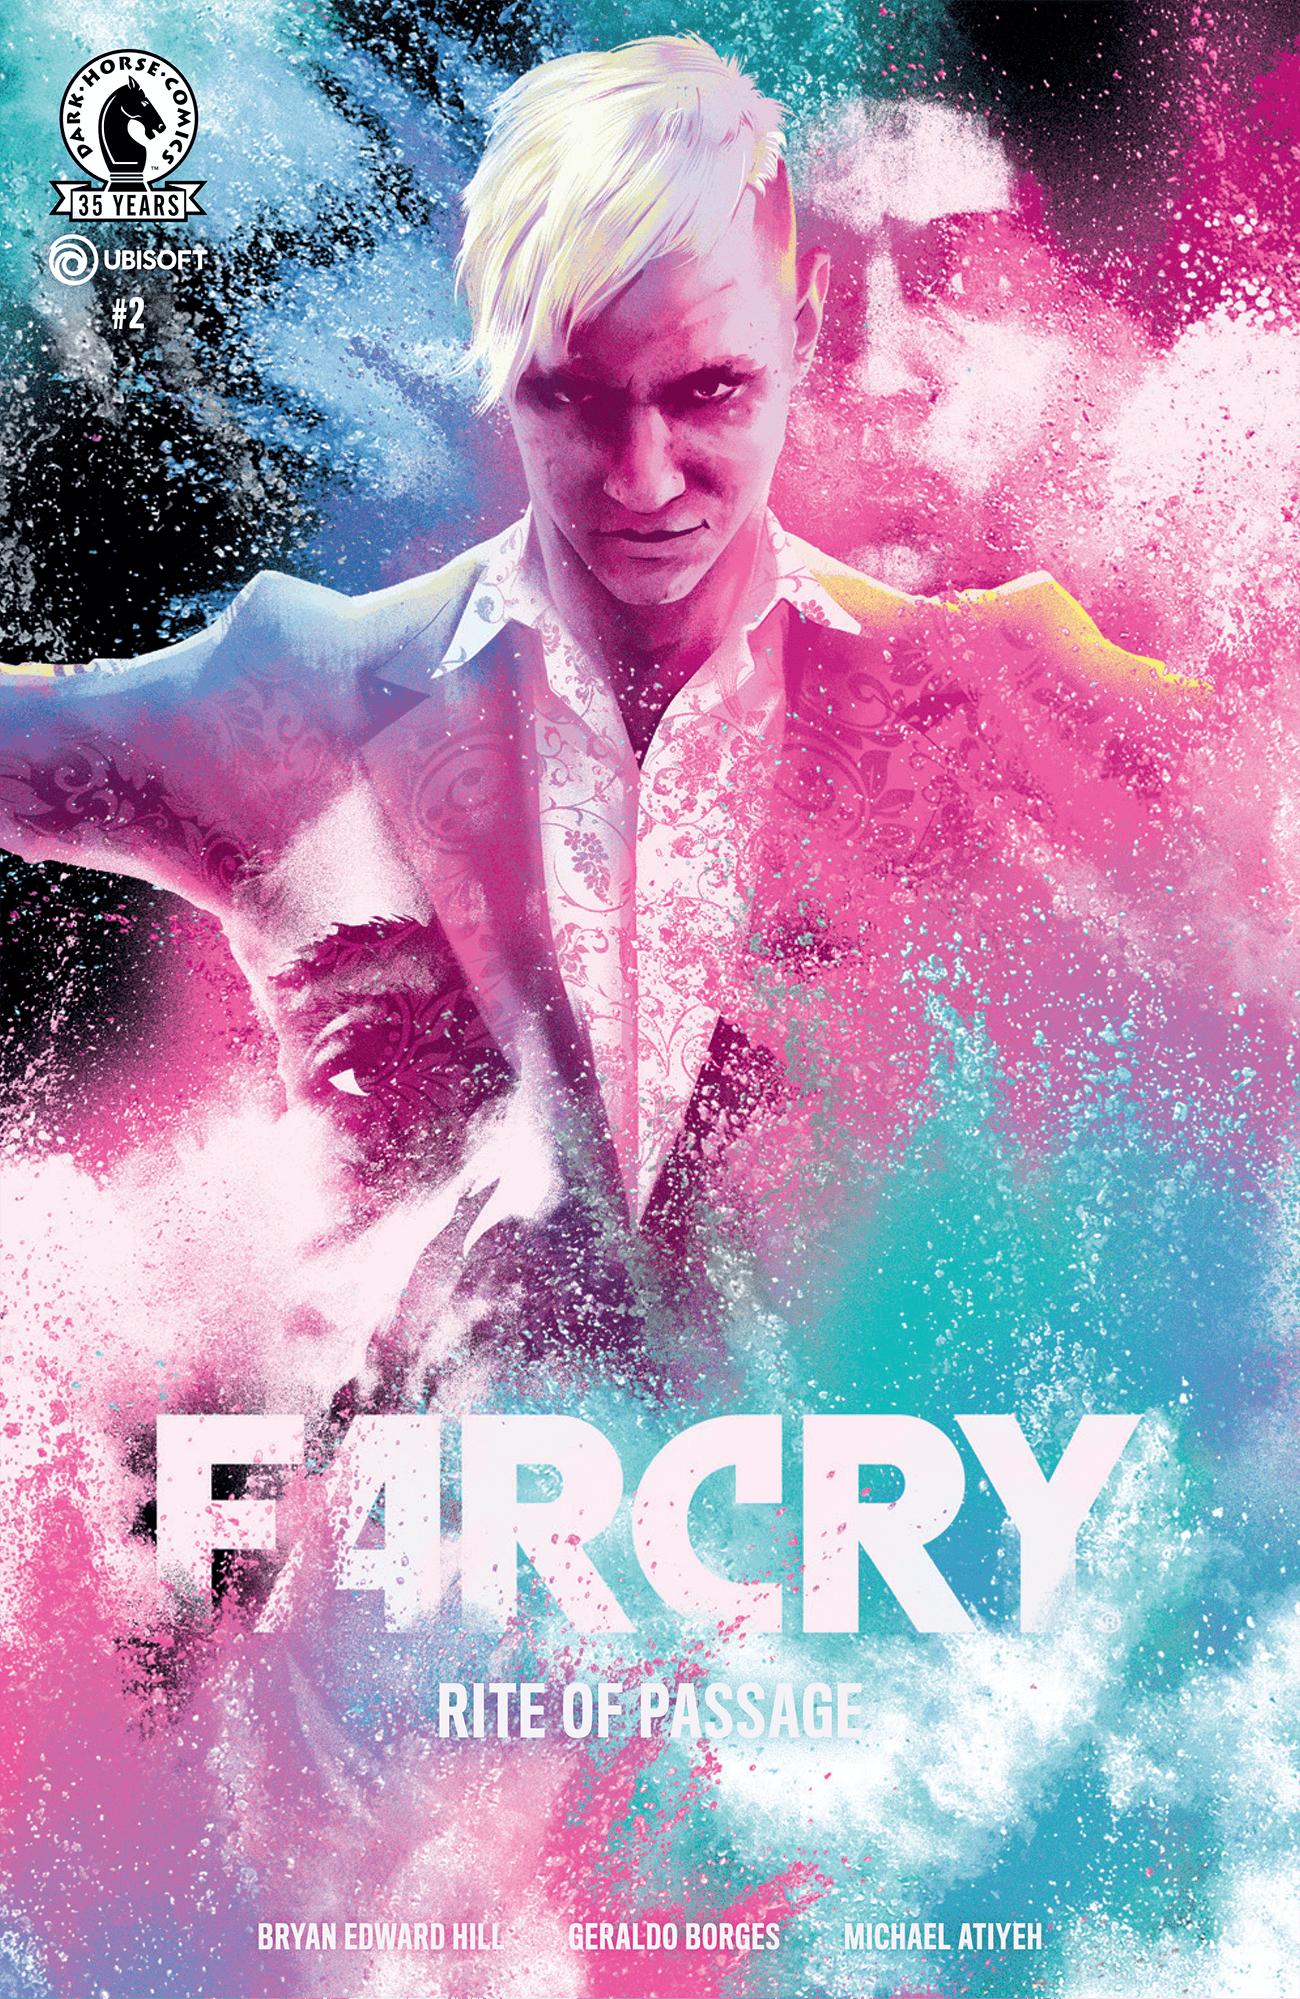 Far Cry: Rite of Passage